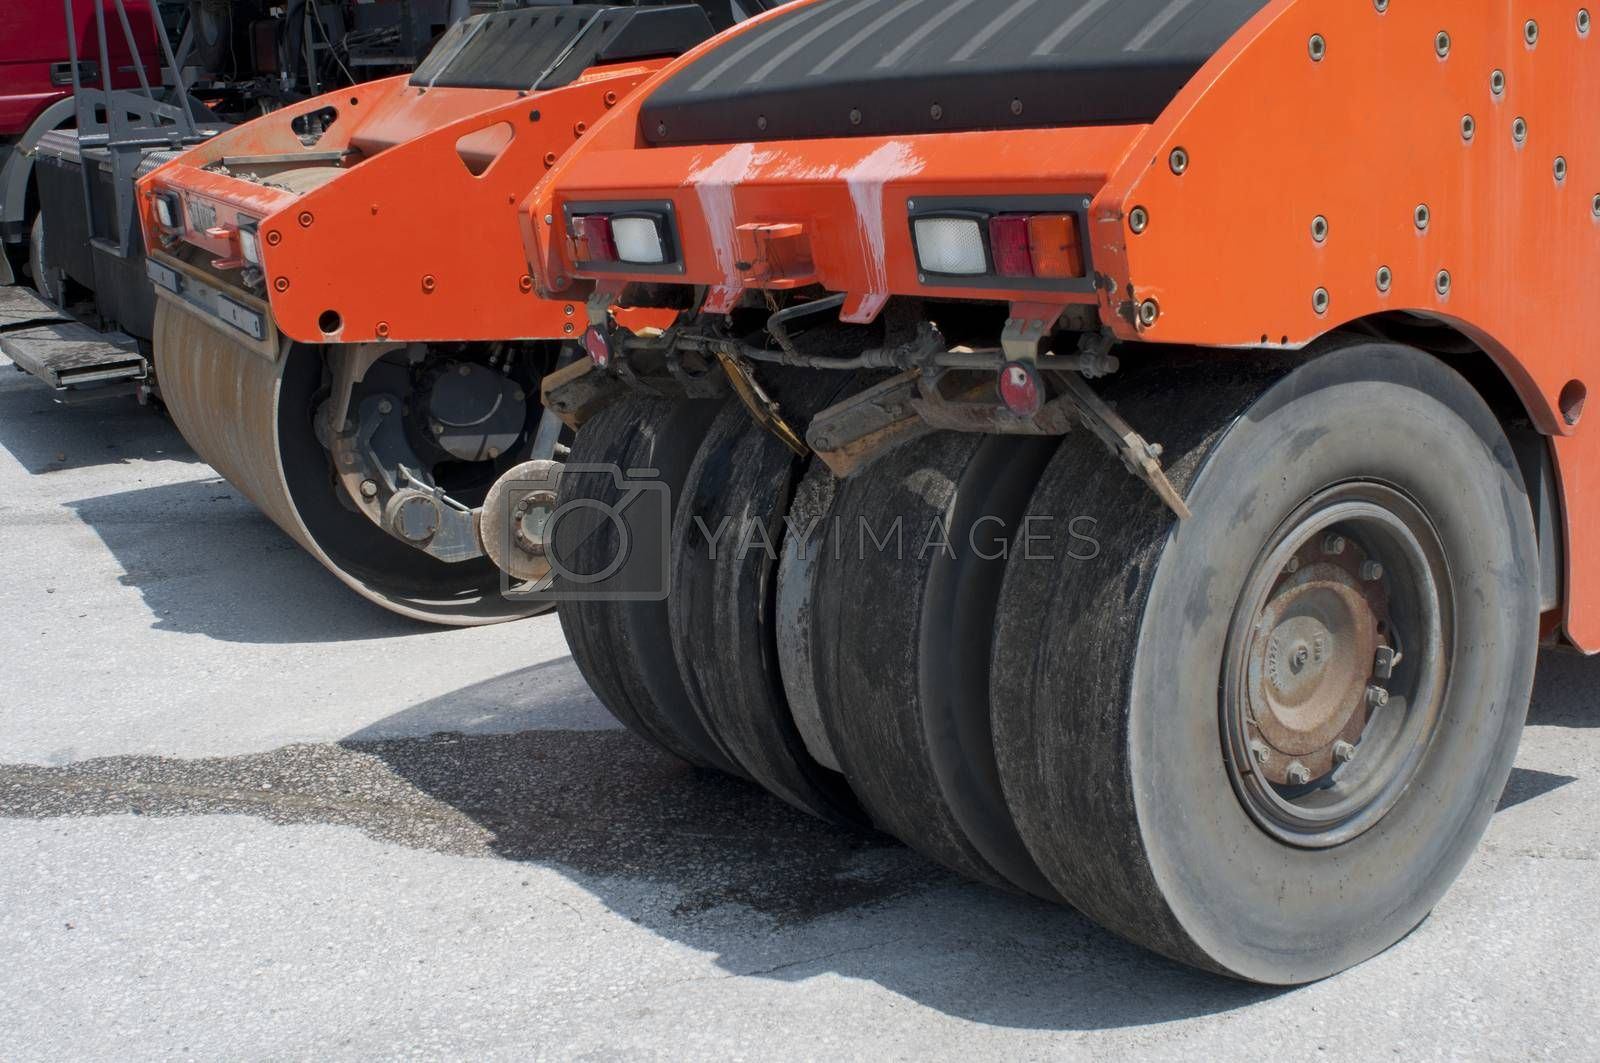 Two asphalt rollers close-up